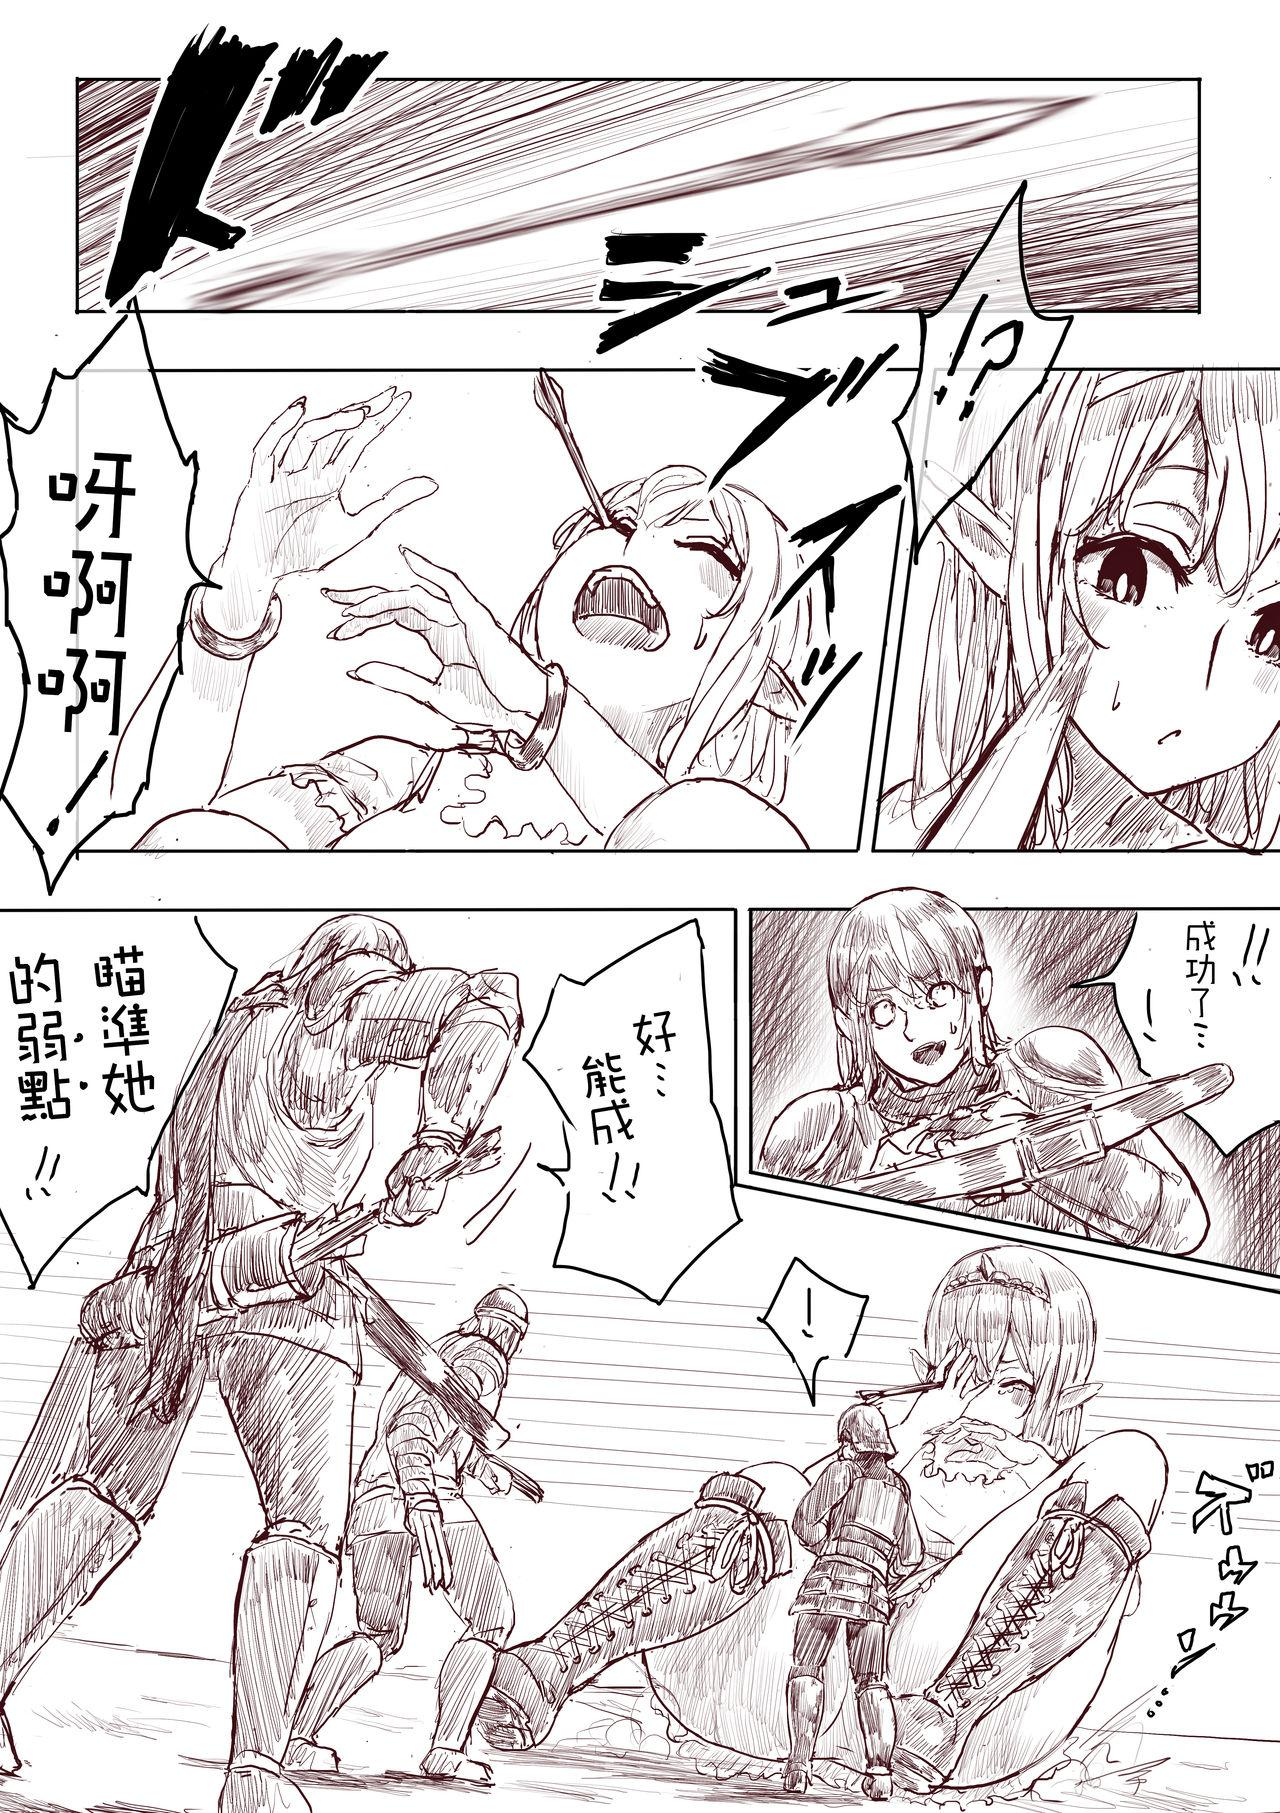 Elf Princess Strikes Back Part1 52